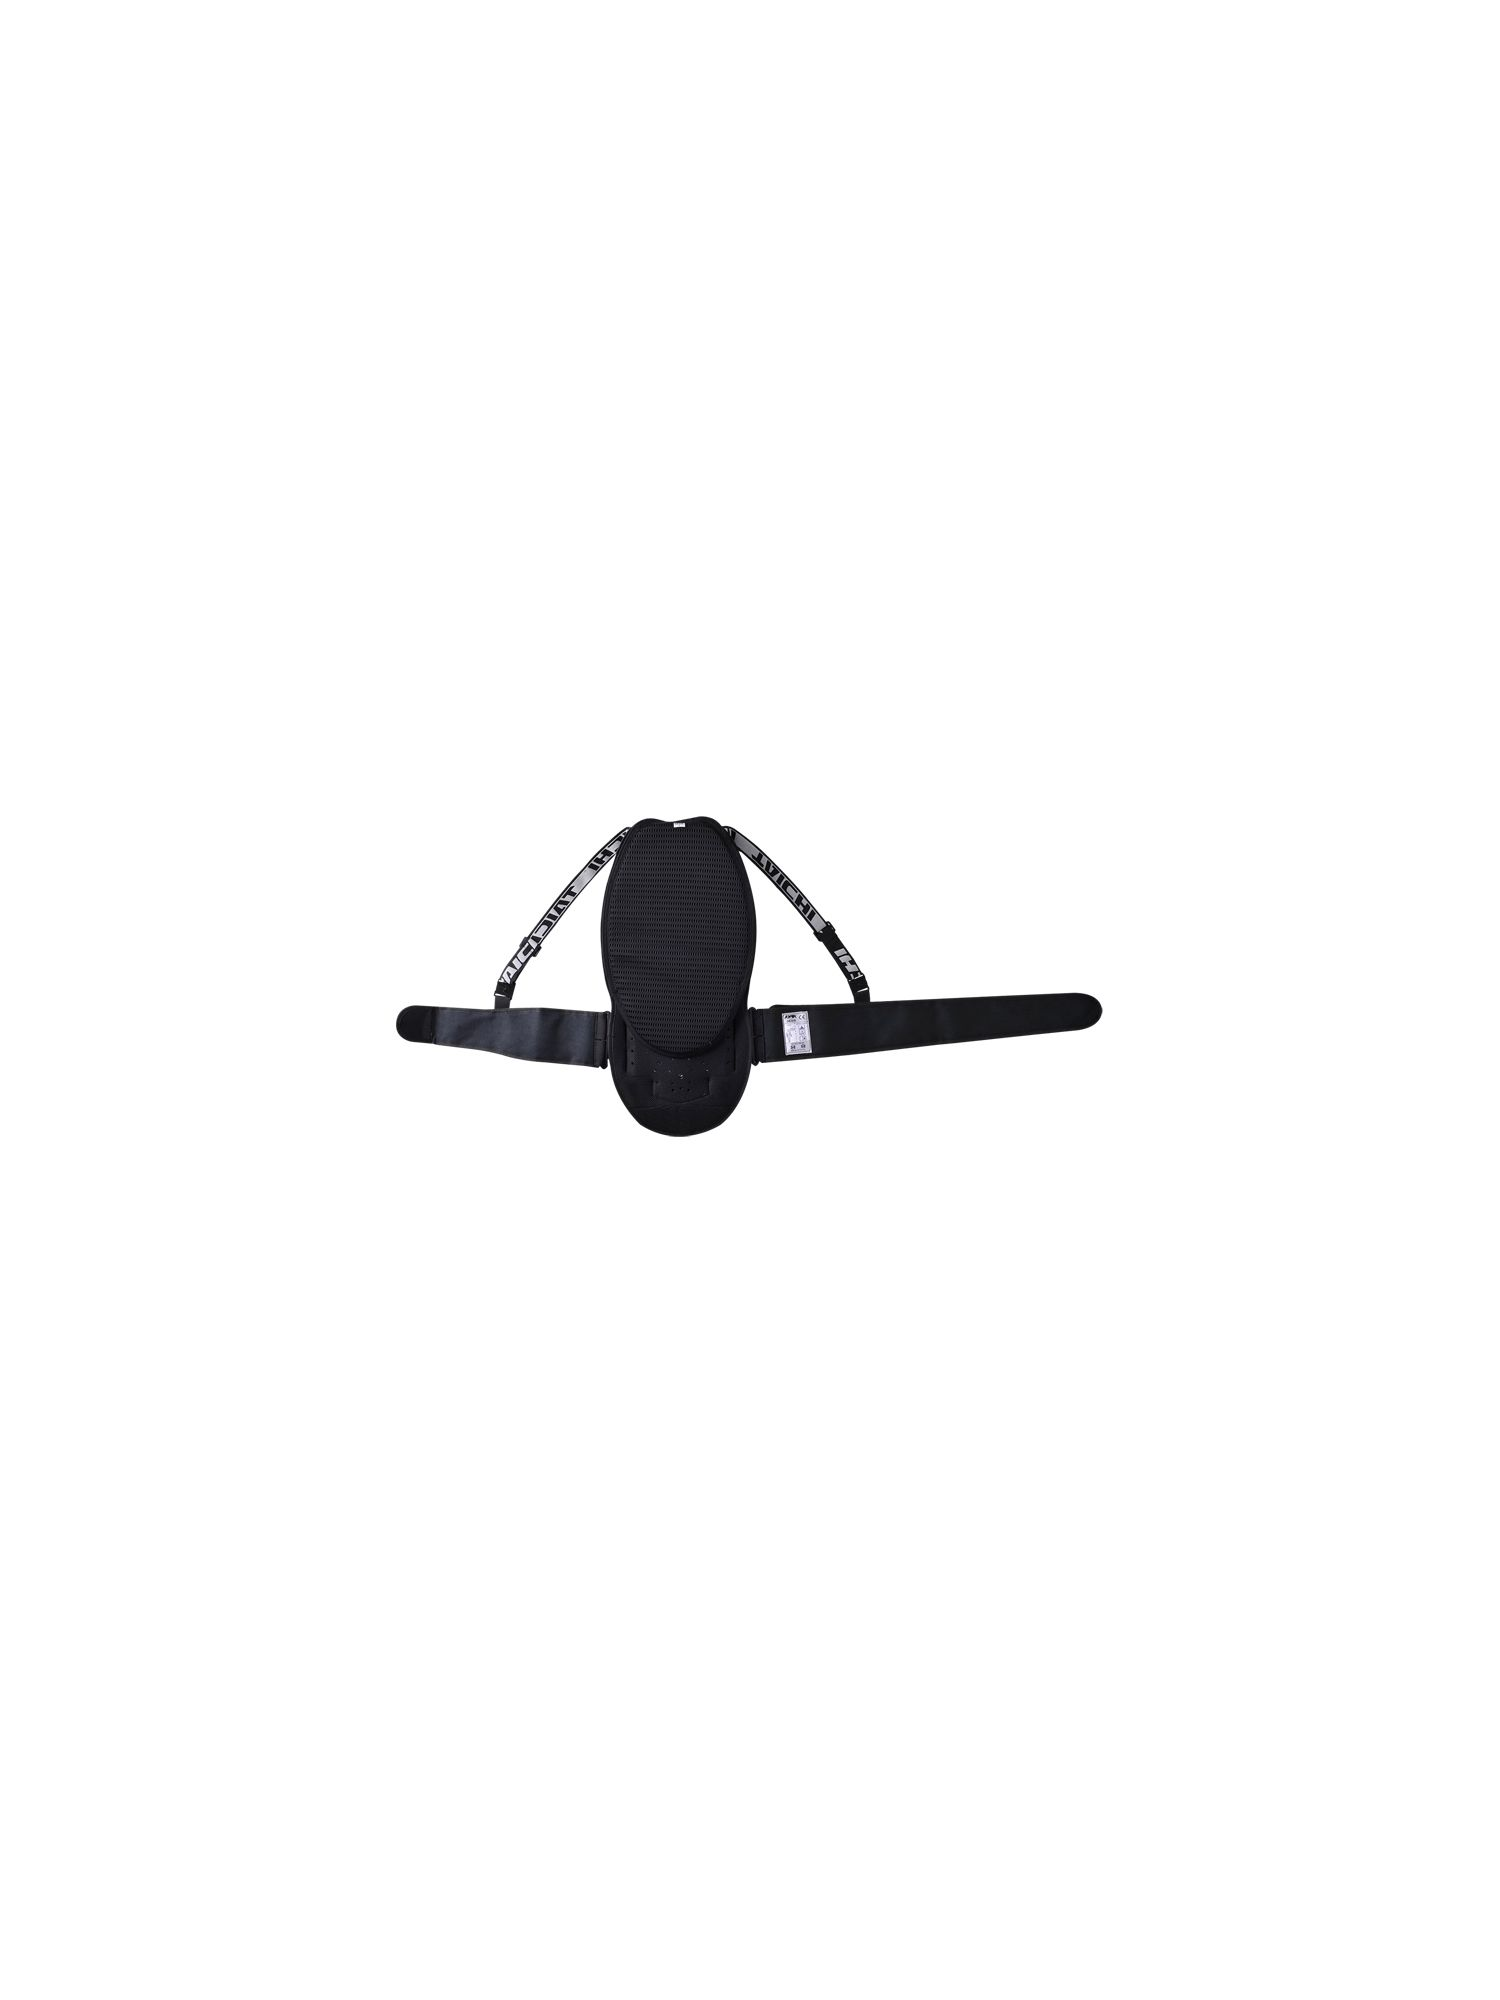 NXV311 | CE フレックス バックプロテクター[1color]